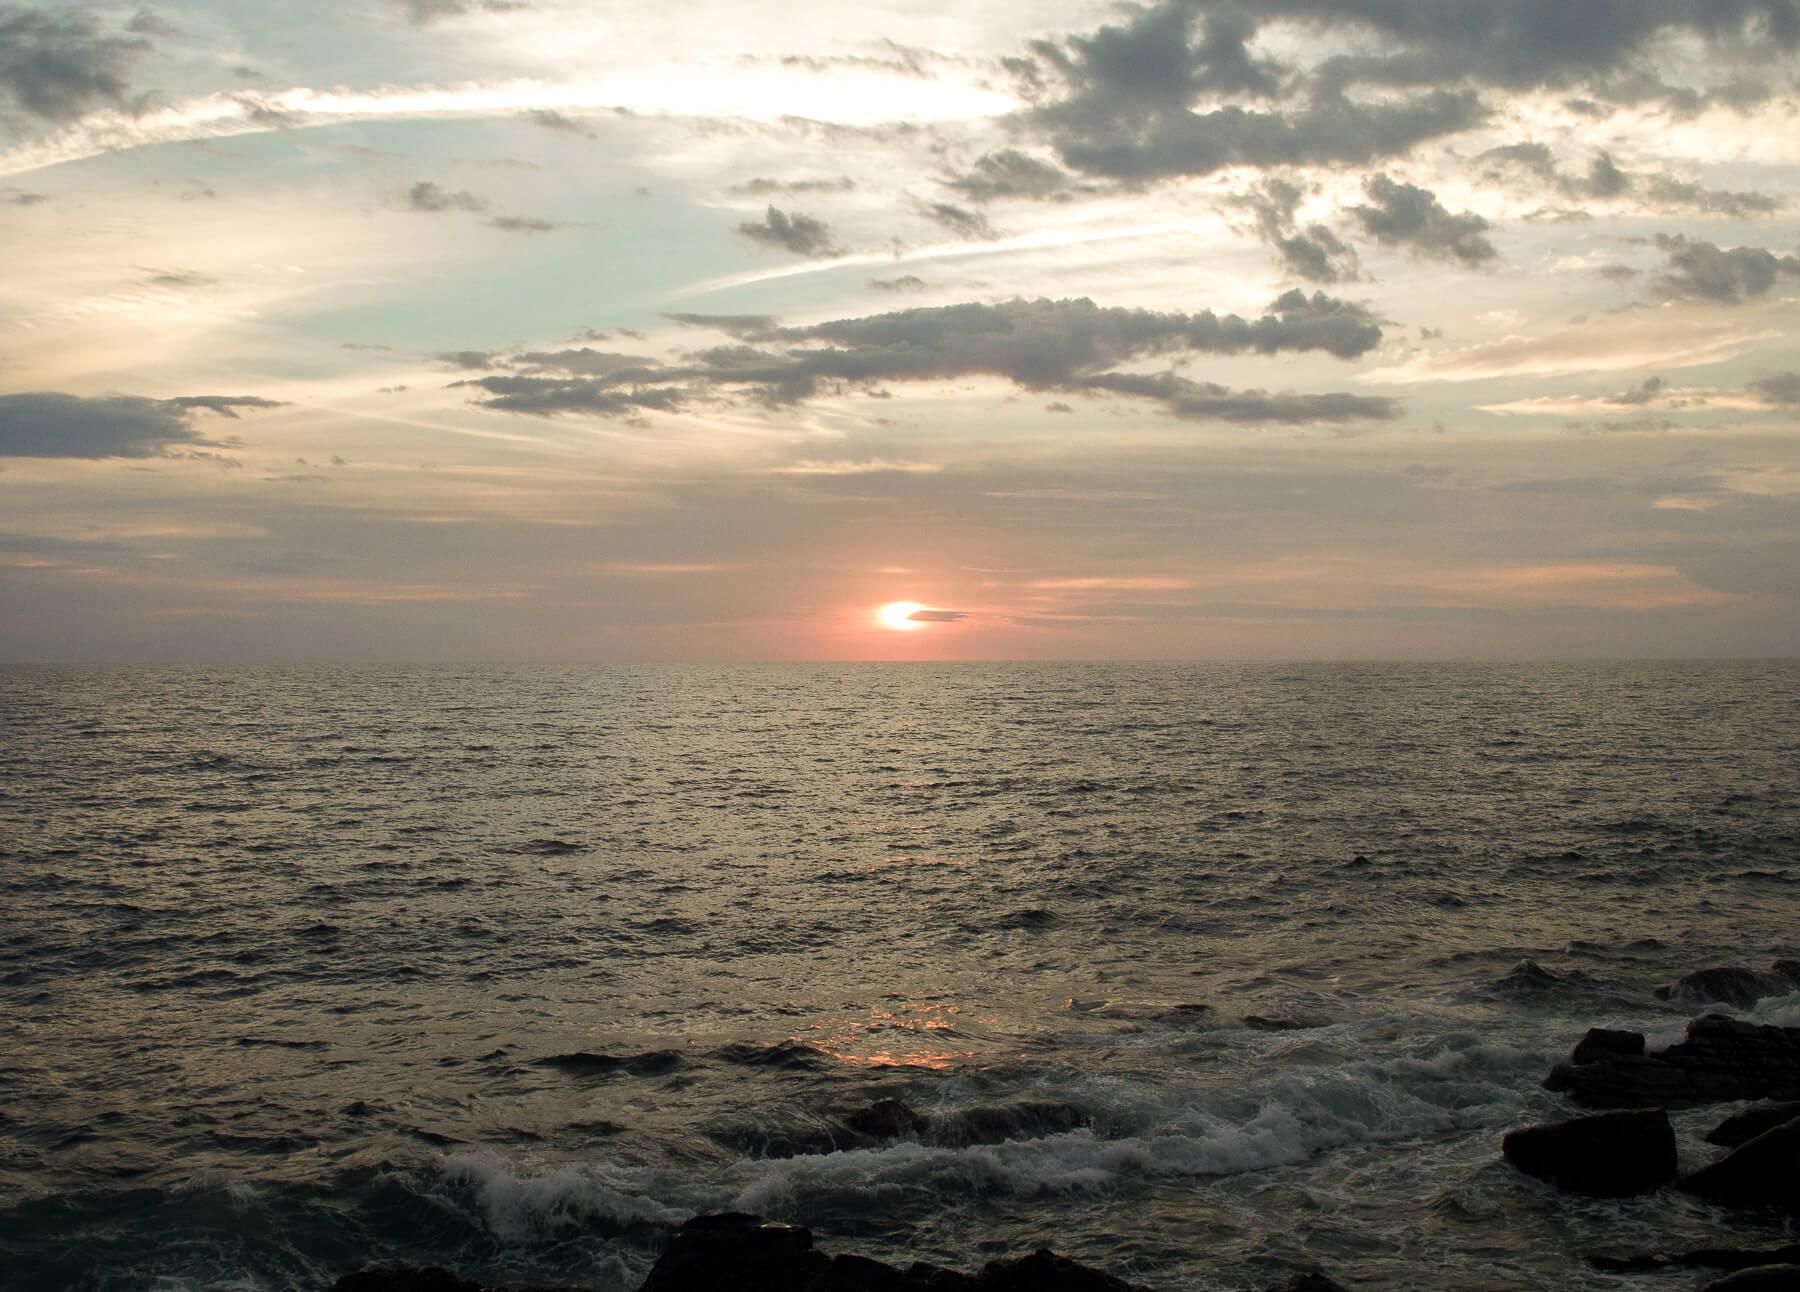 Sun setting behind the ocean!